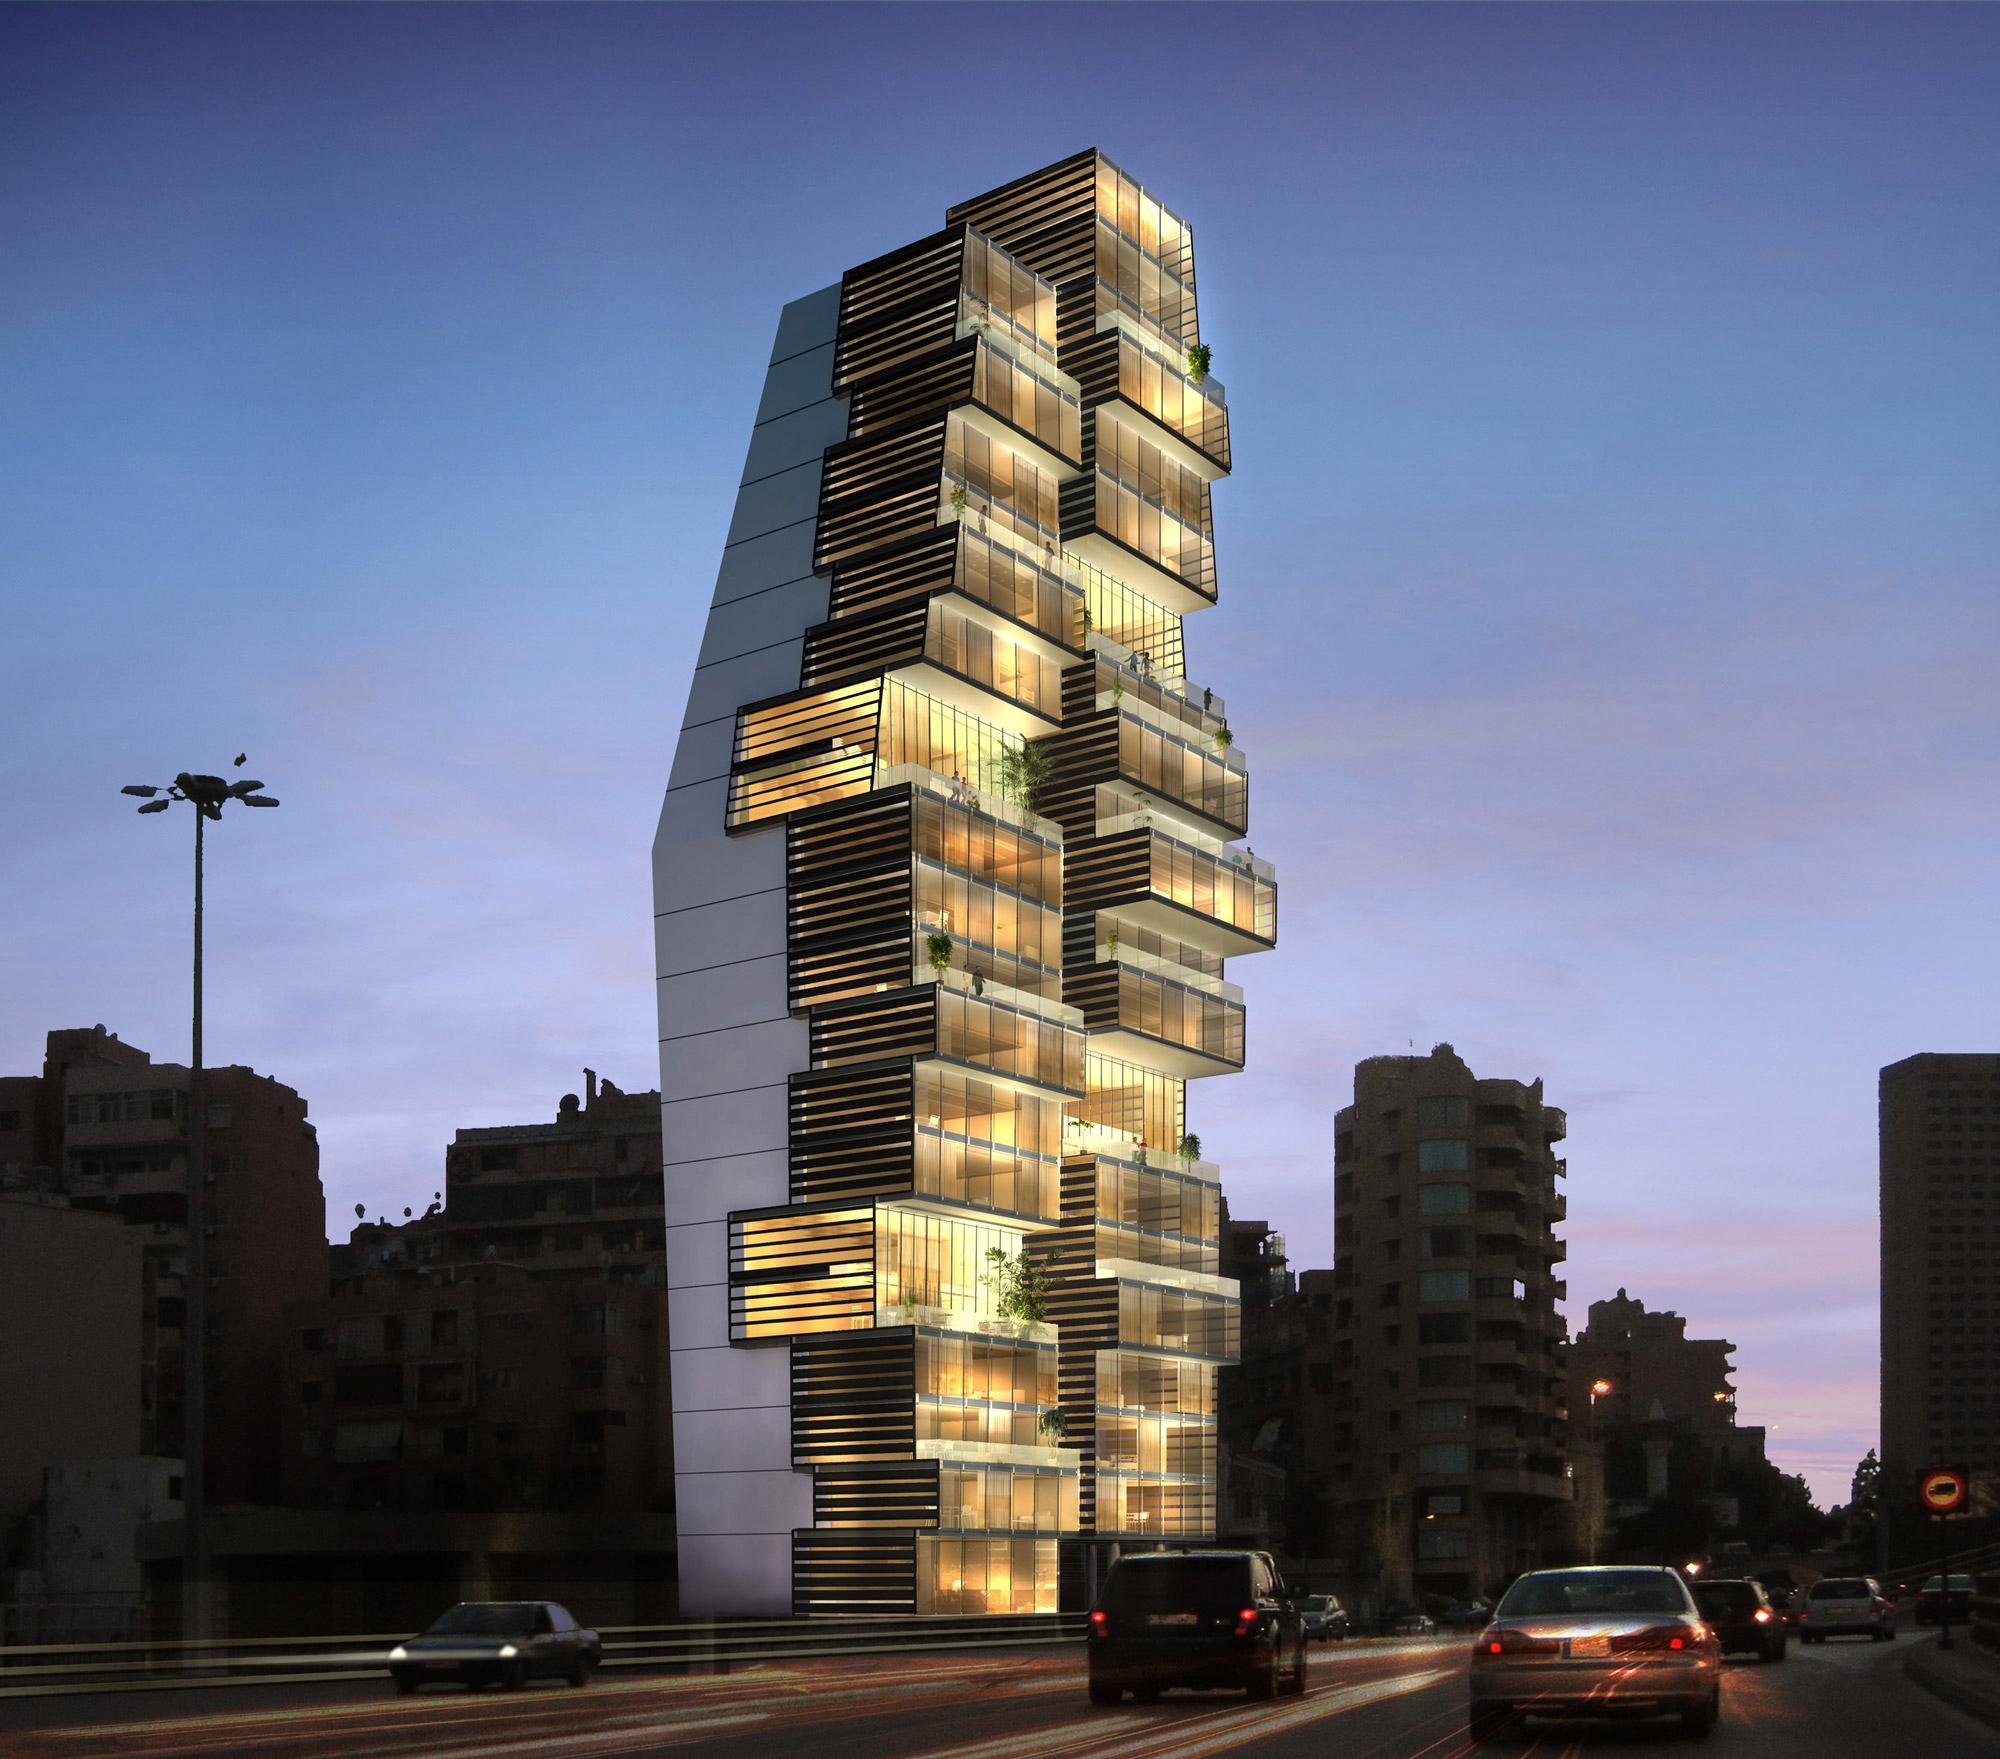 Beirut Wallpapers Hd